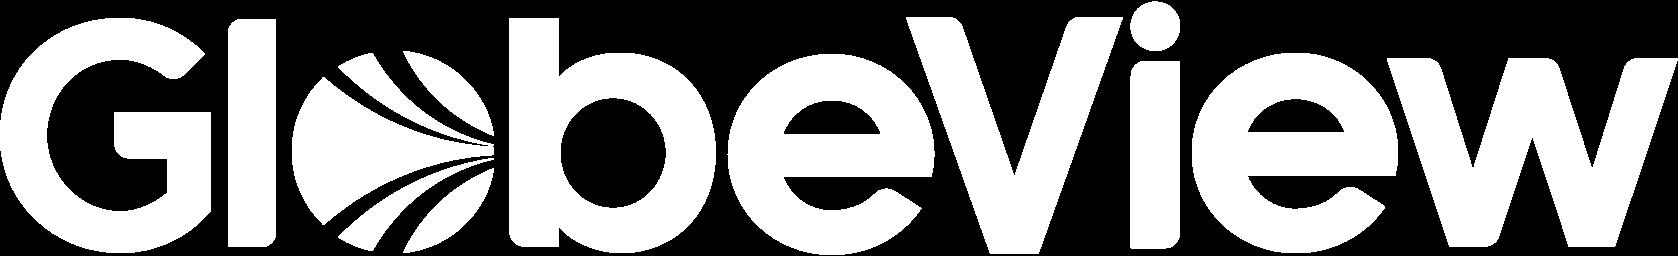 GlobeView